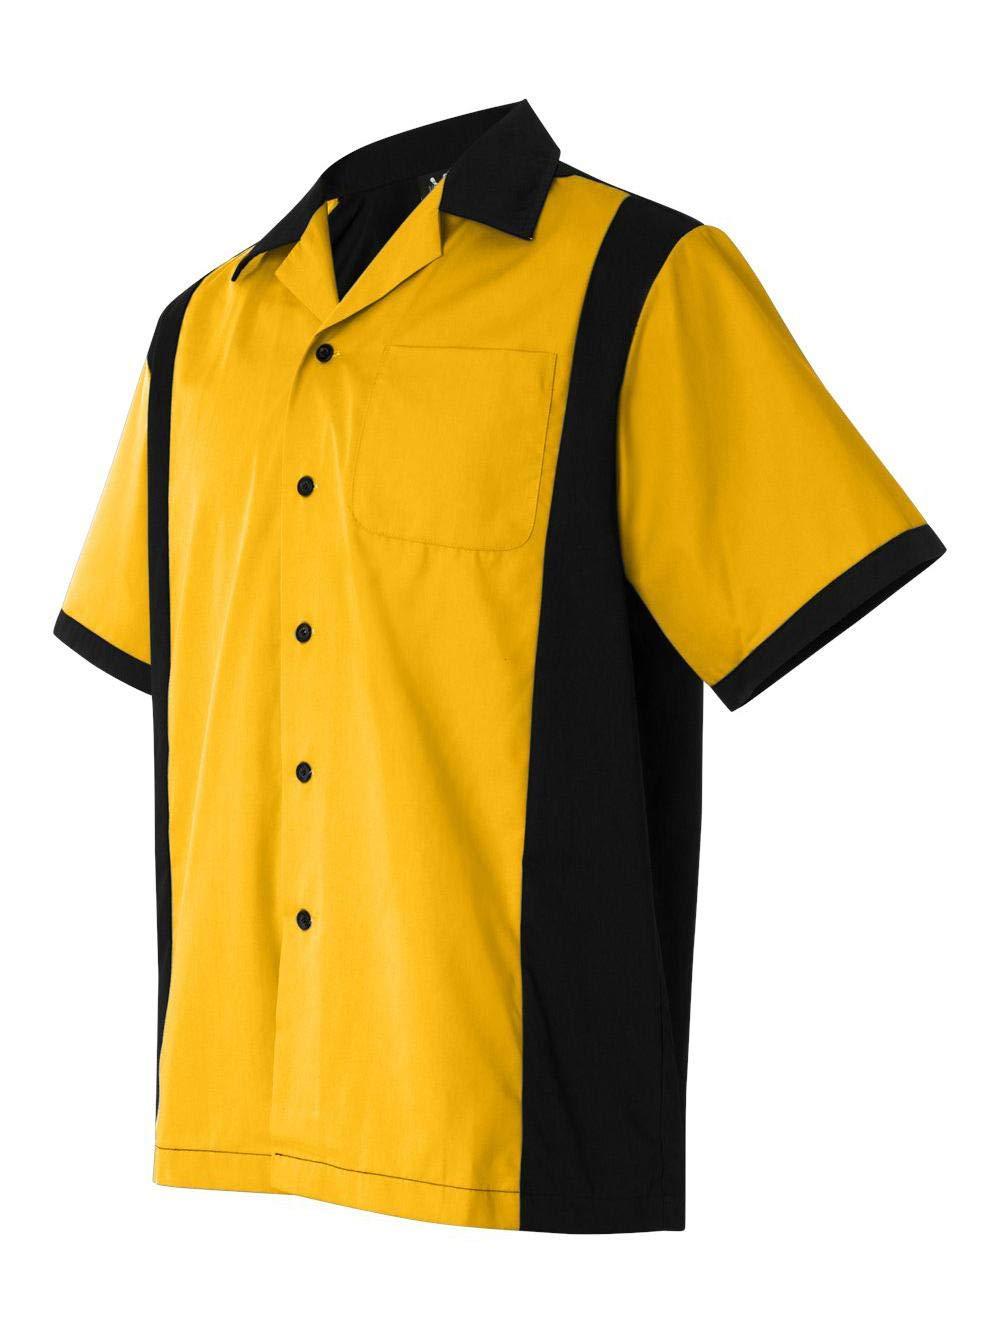 Hilton HP2243 Men's Cruiser Bowling Shirt Gold Small by Hilton